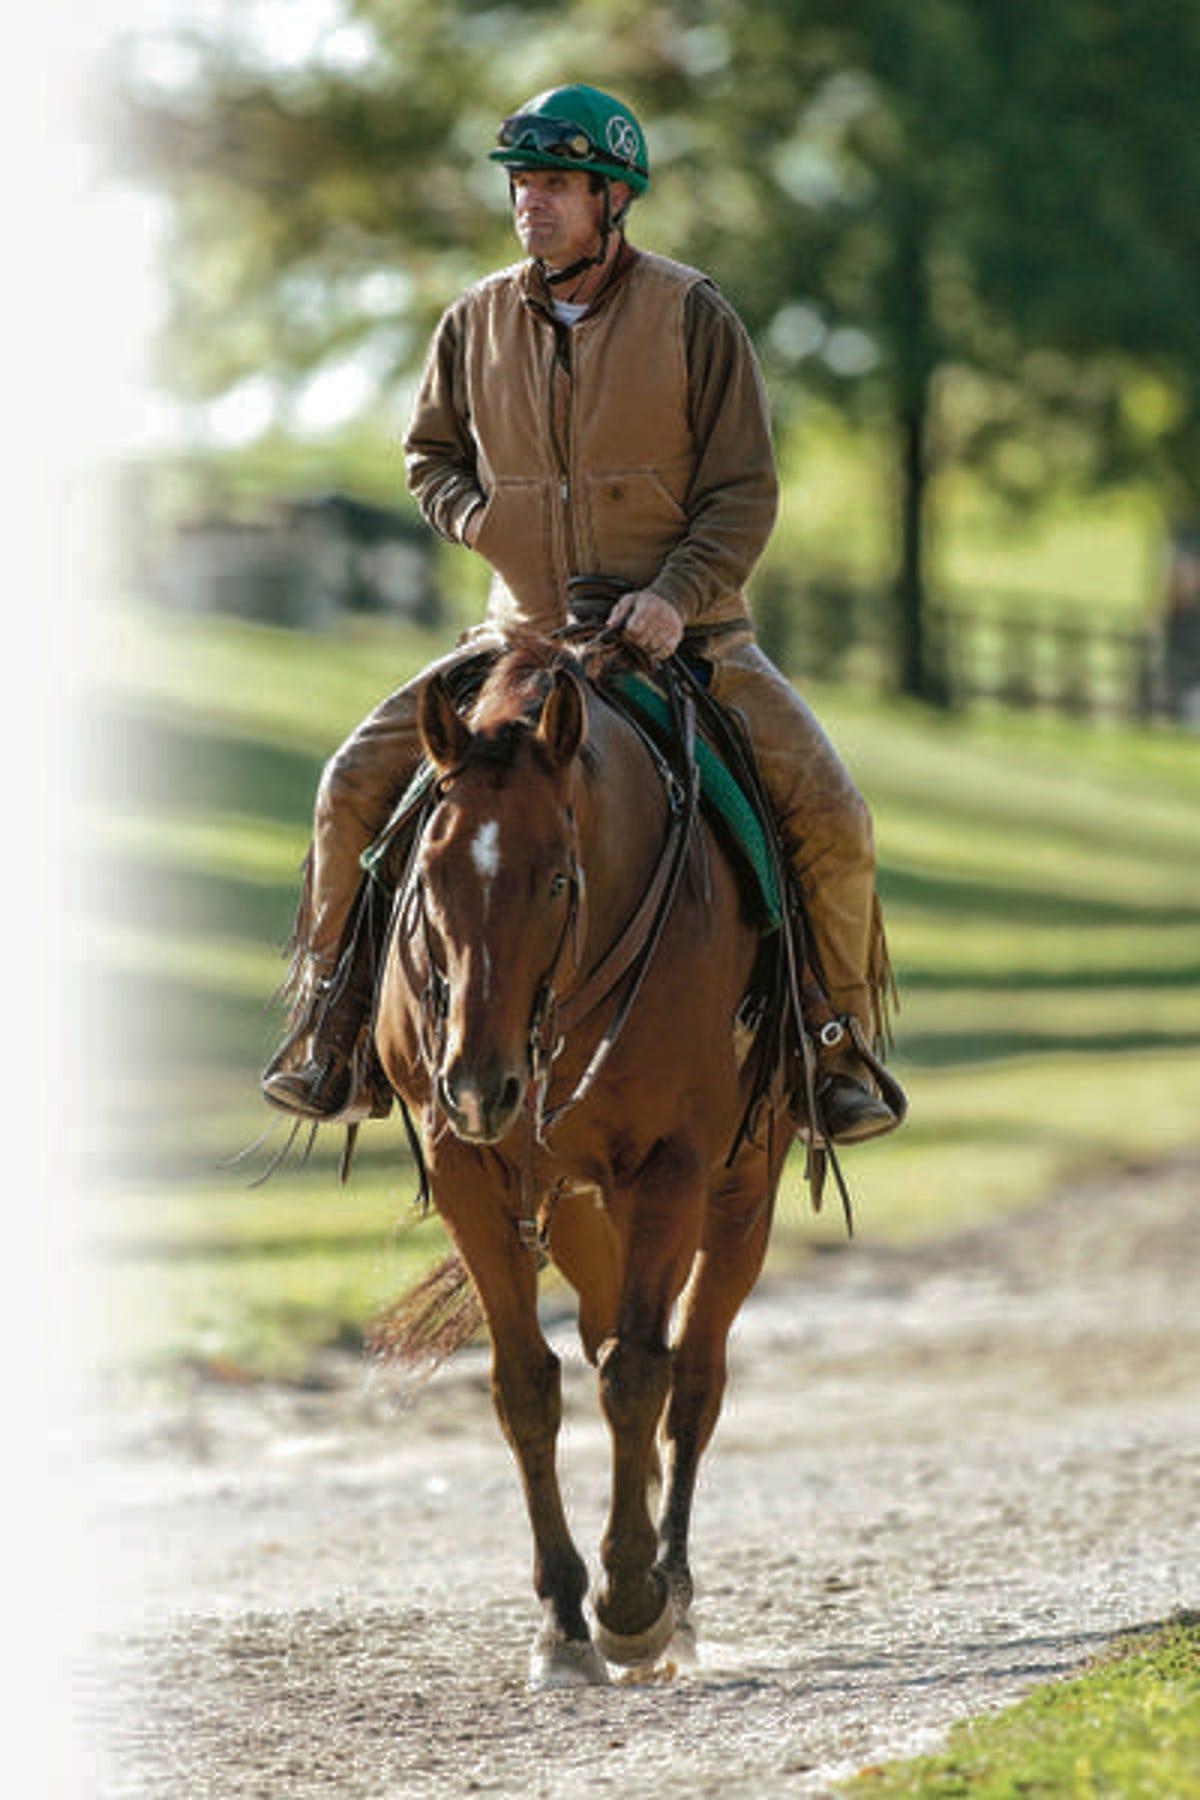 Kentucky Derby 2015 | Trainer Kellyn Gorder suspended after horse